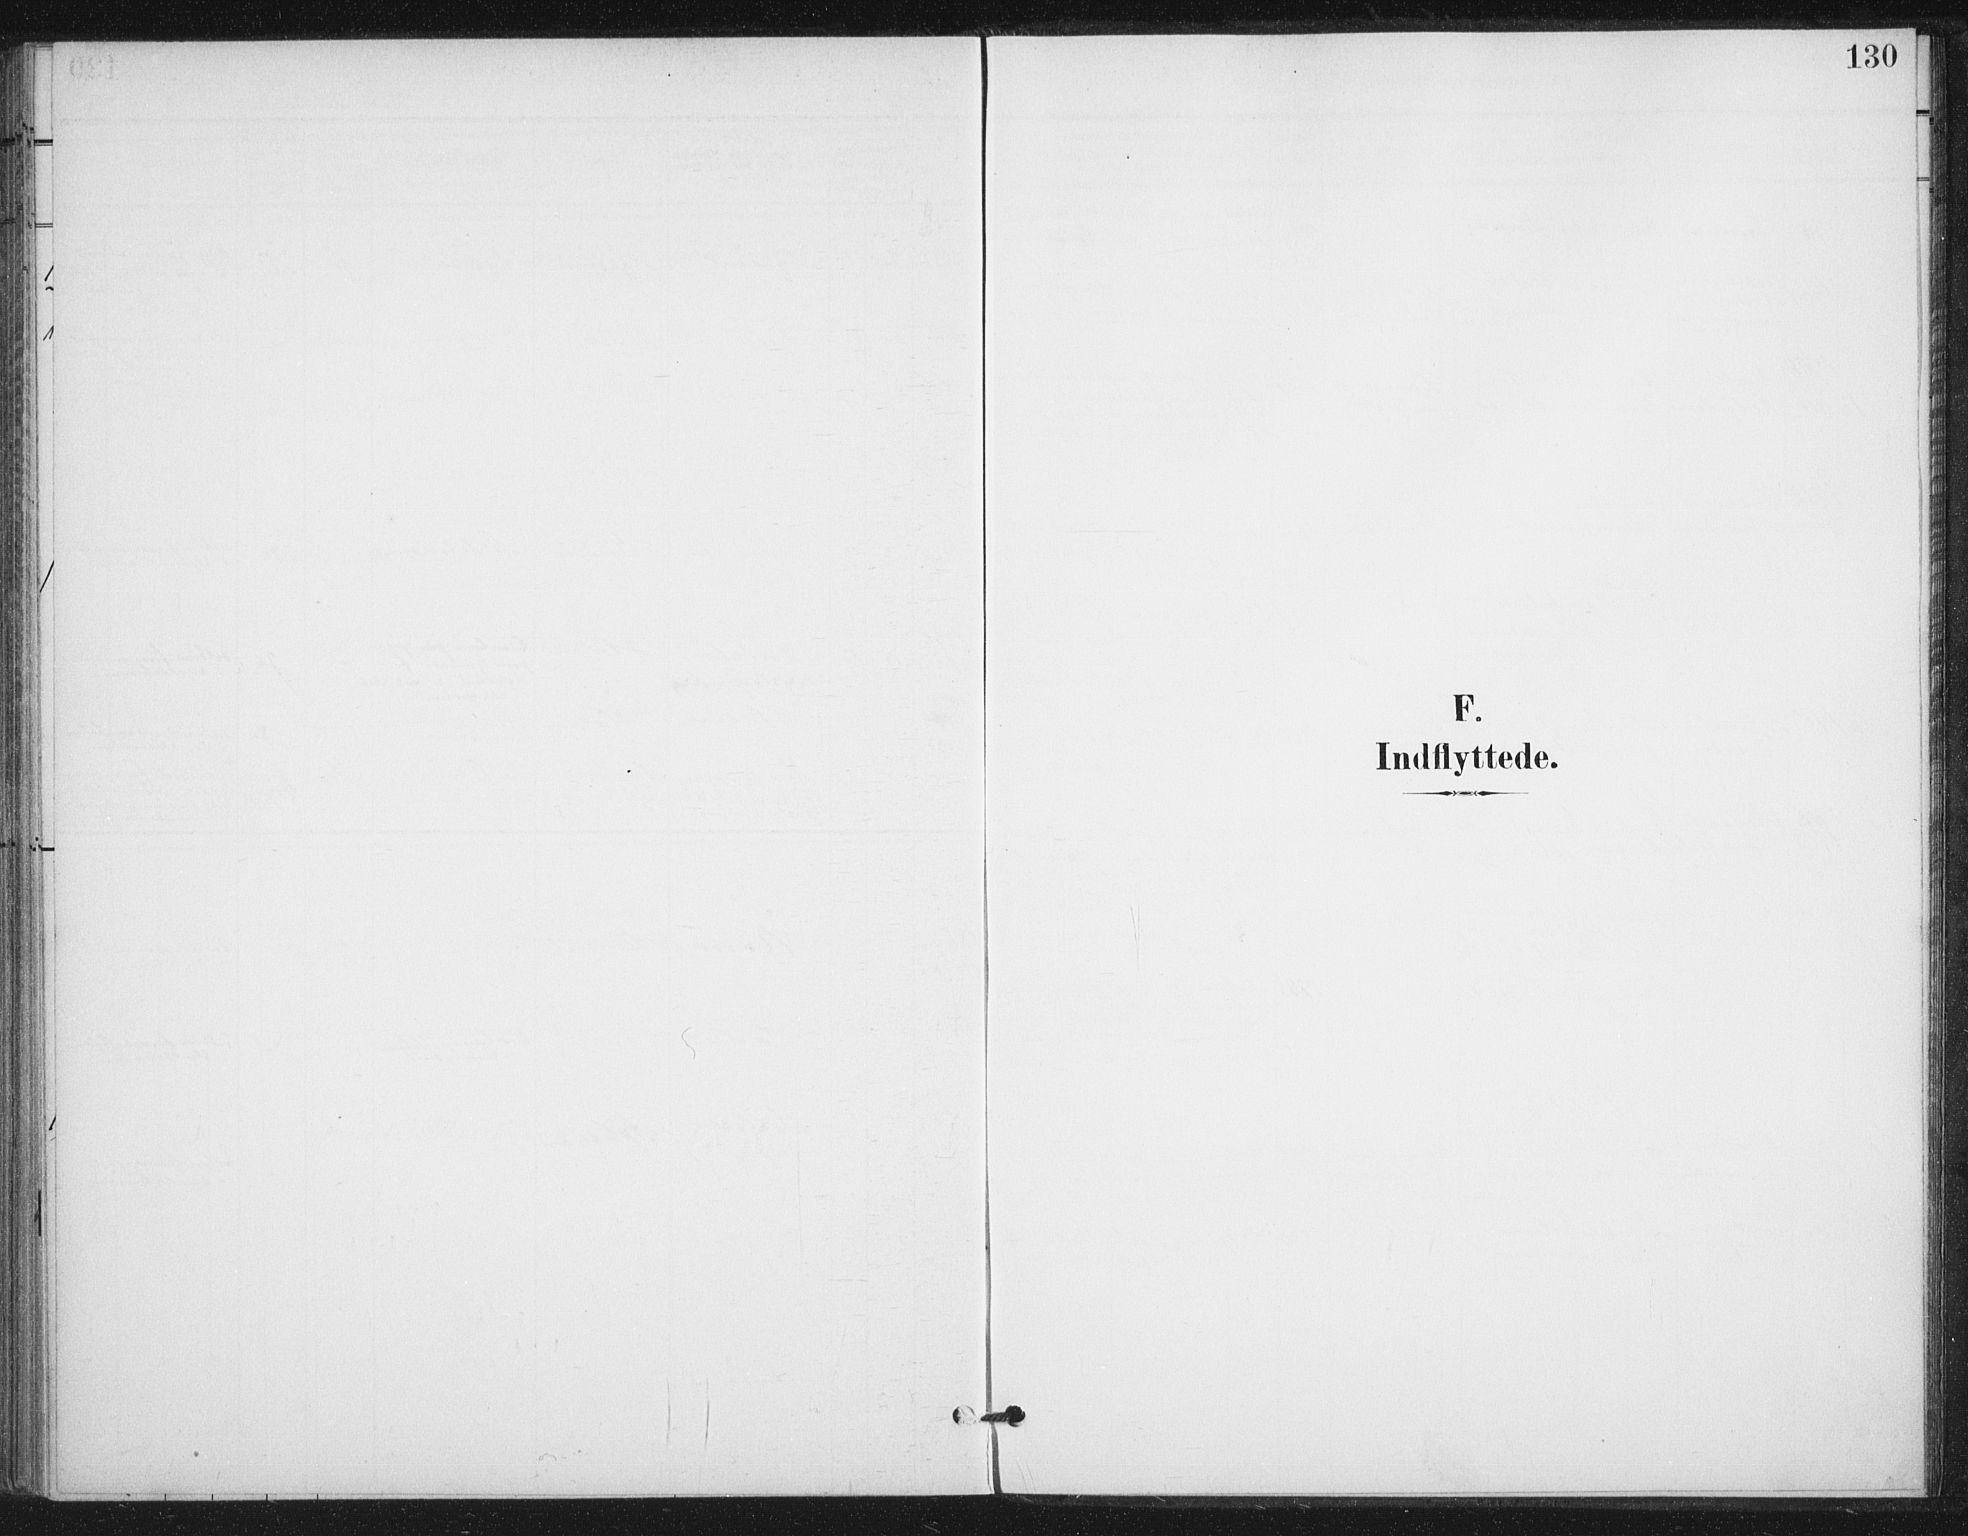 SAT, Ministerialprotokoller, klokkerbøker og fødselsregistre - Nordland, 894/L1356: Ministerialbok nr. 894A02, 1897-1914, s. 130